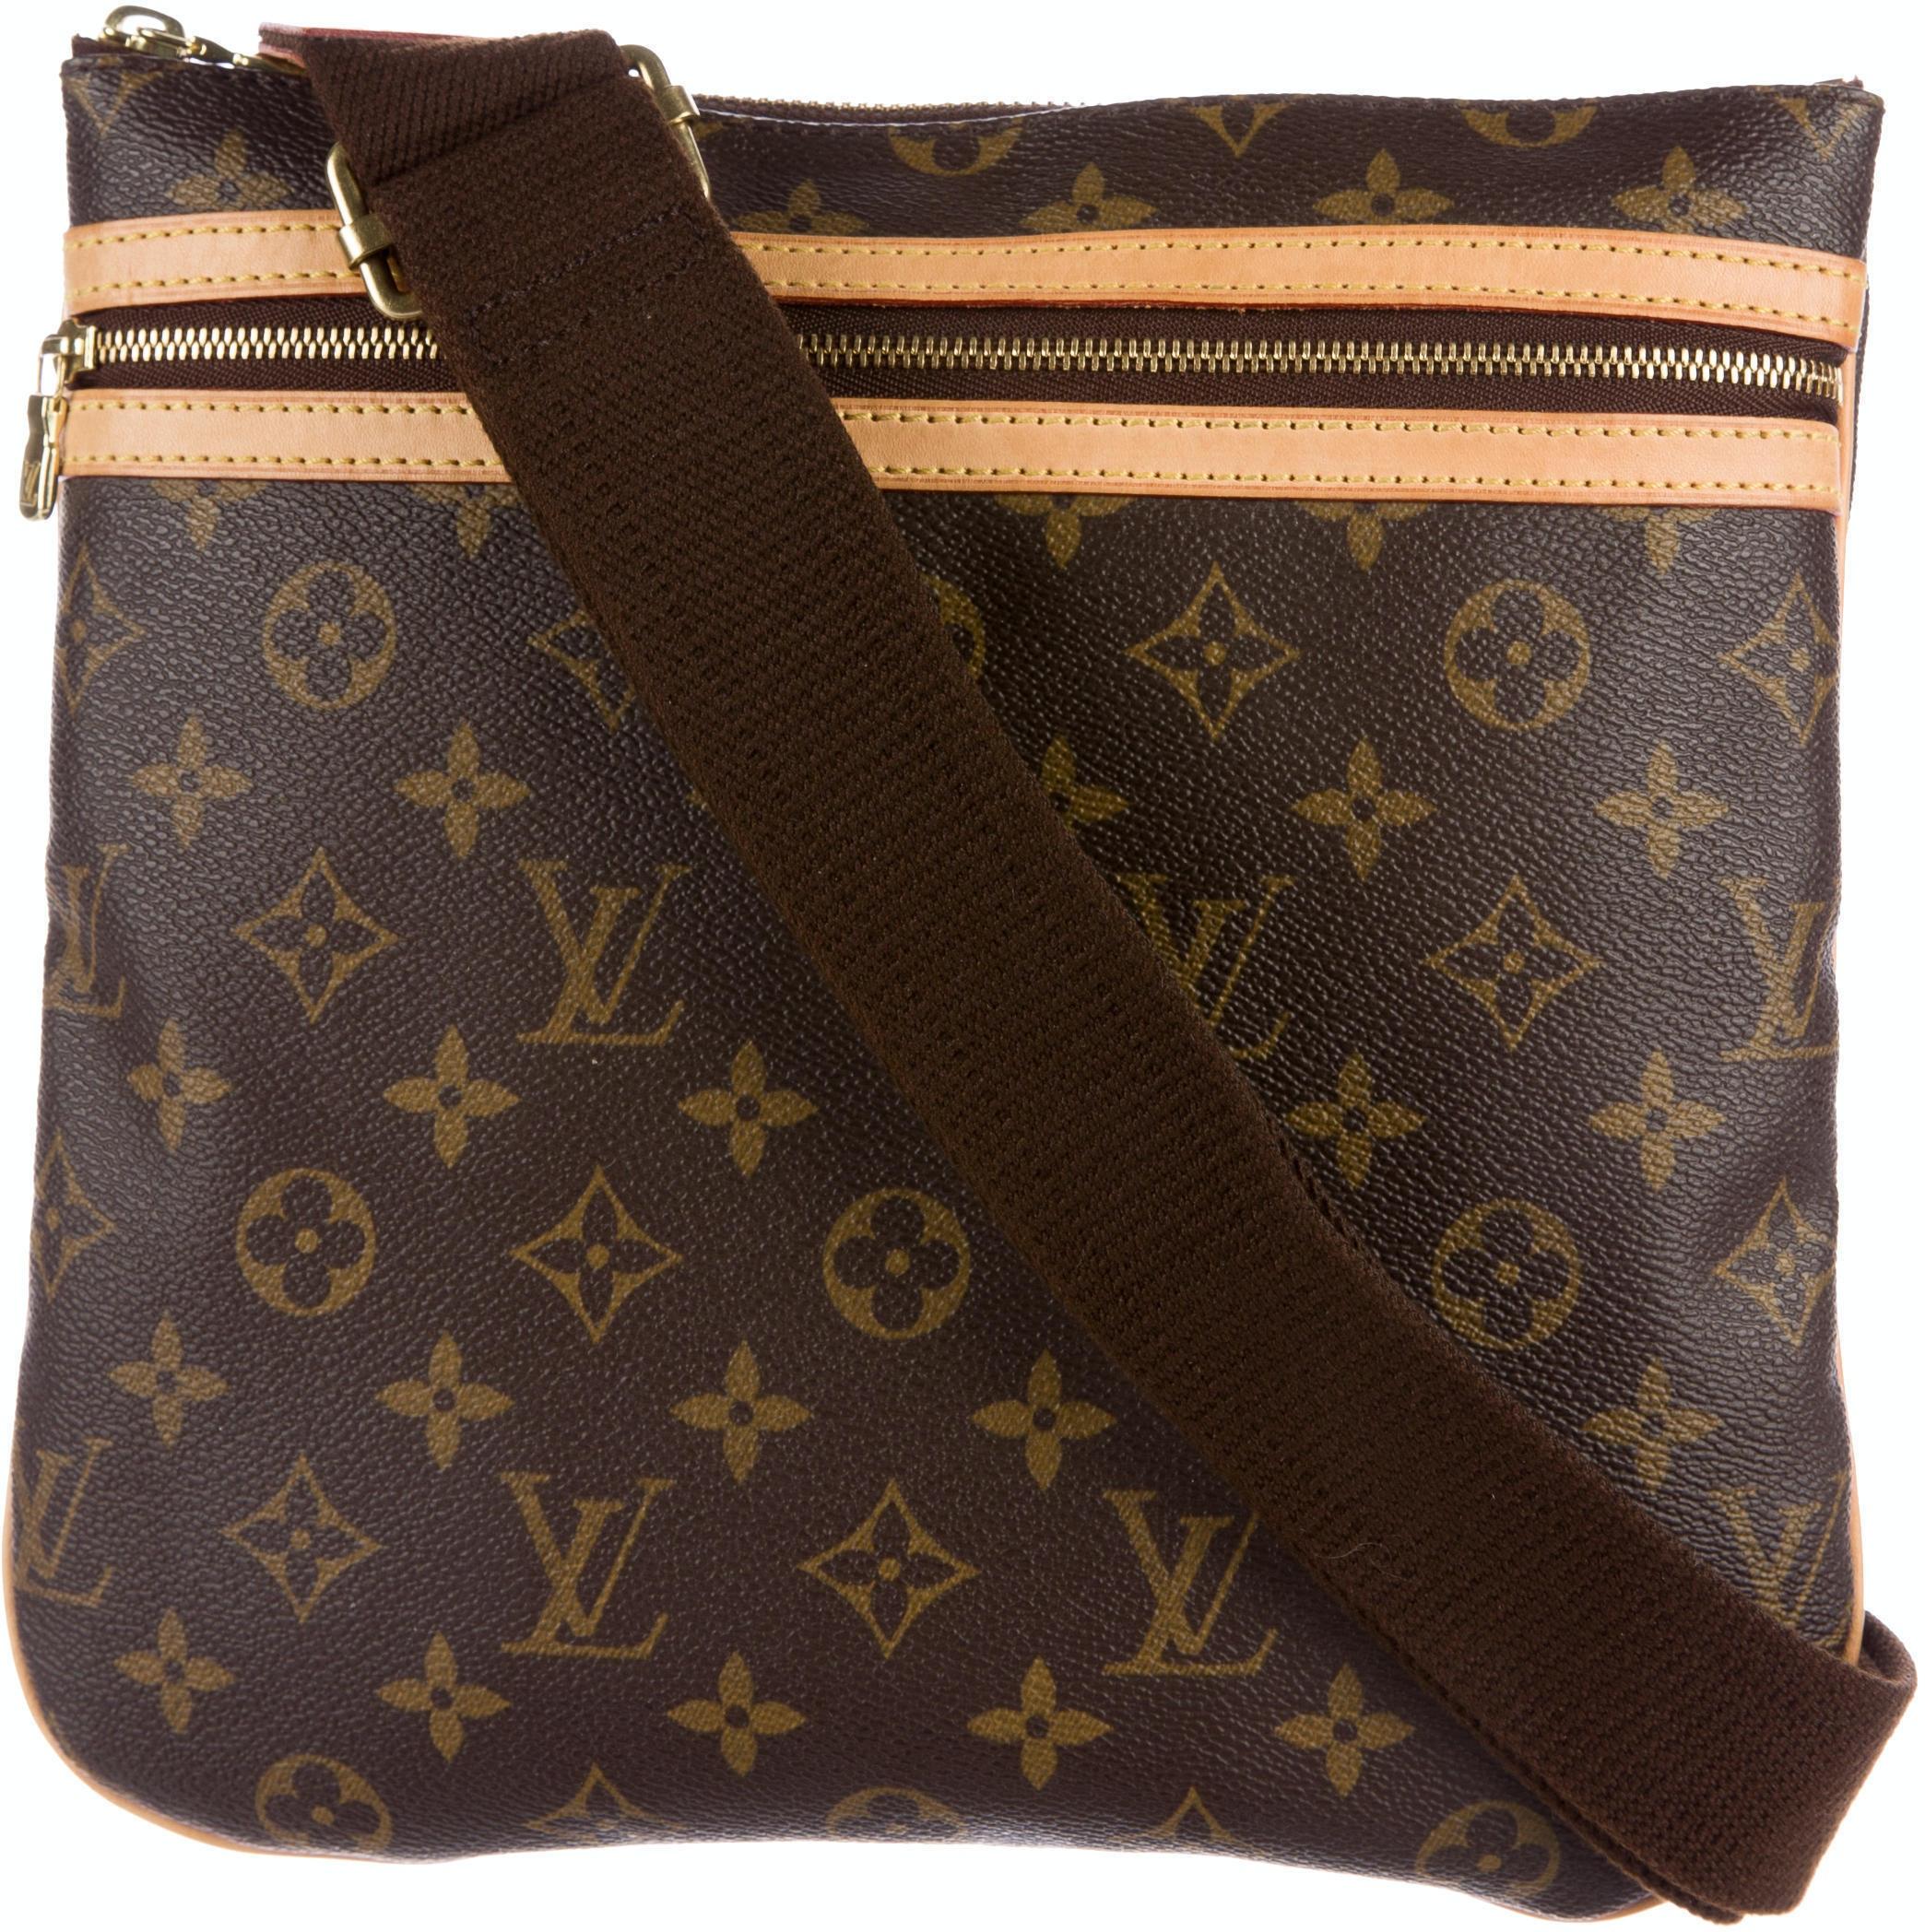 Louis Vuitton Pochette Bosphore Monogram Brown